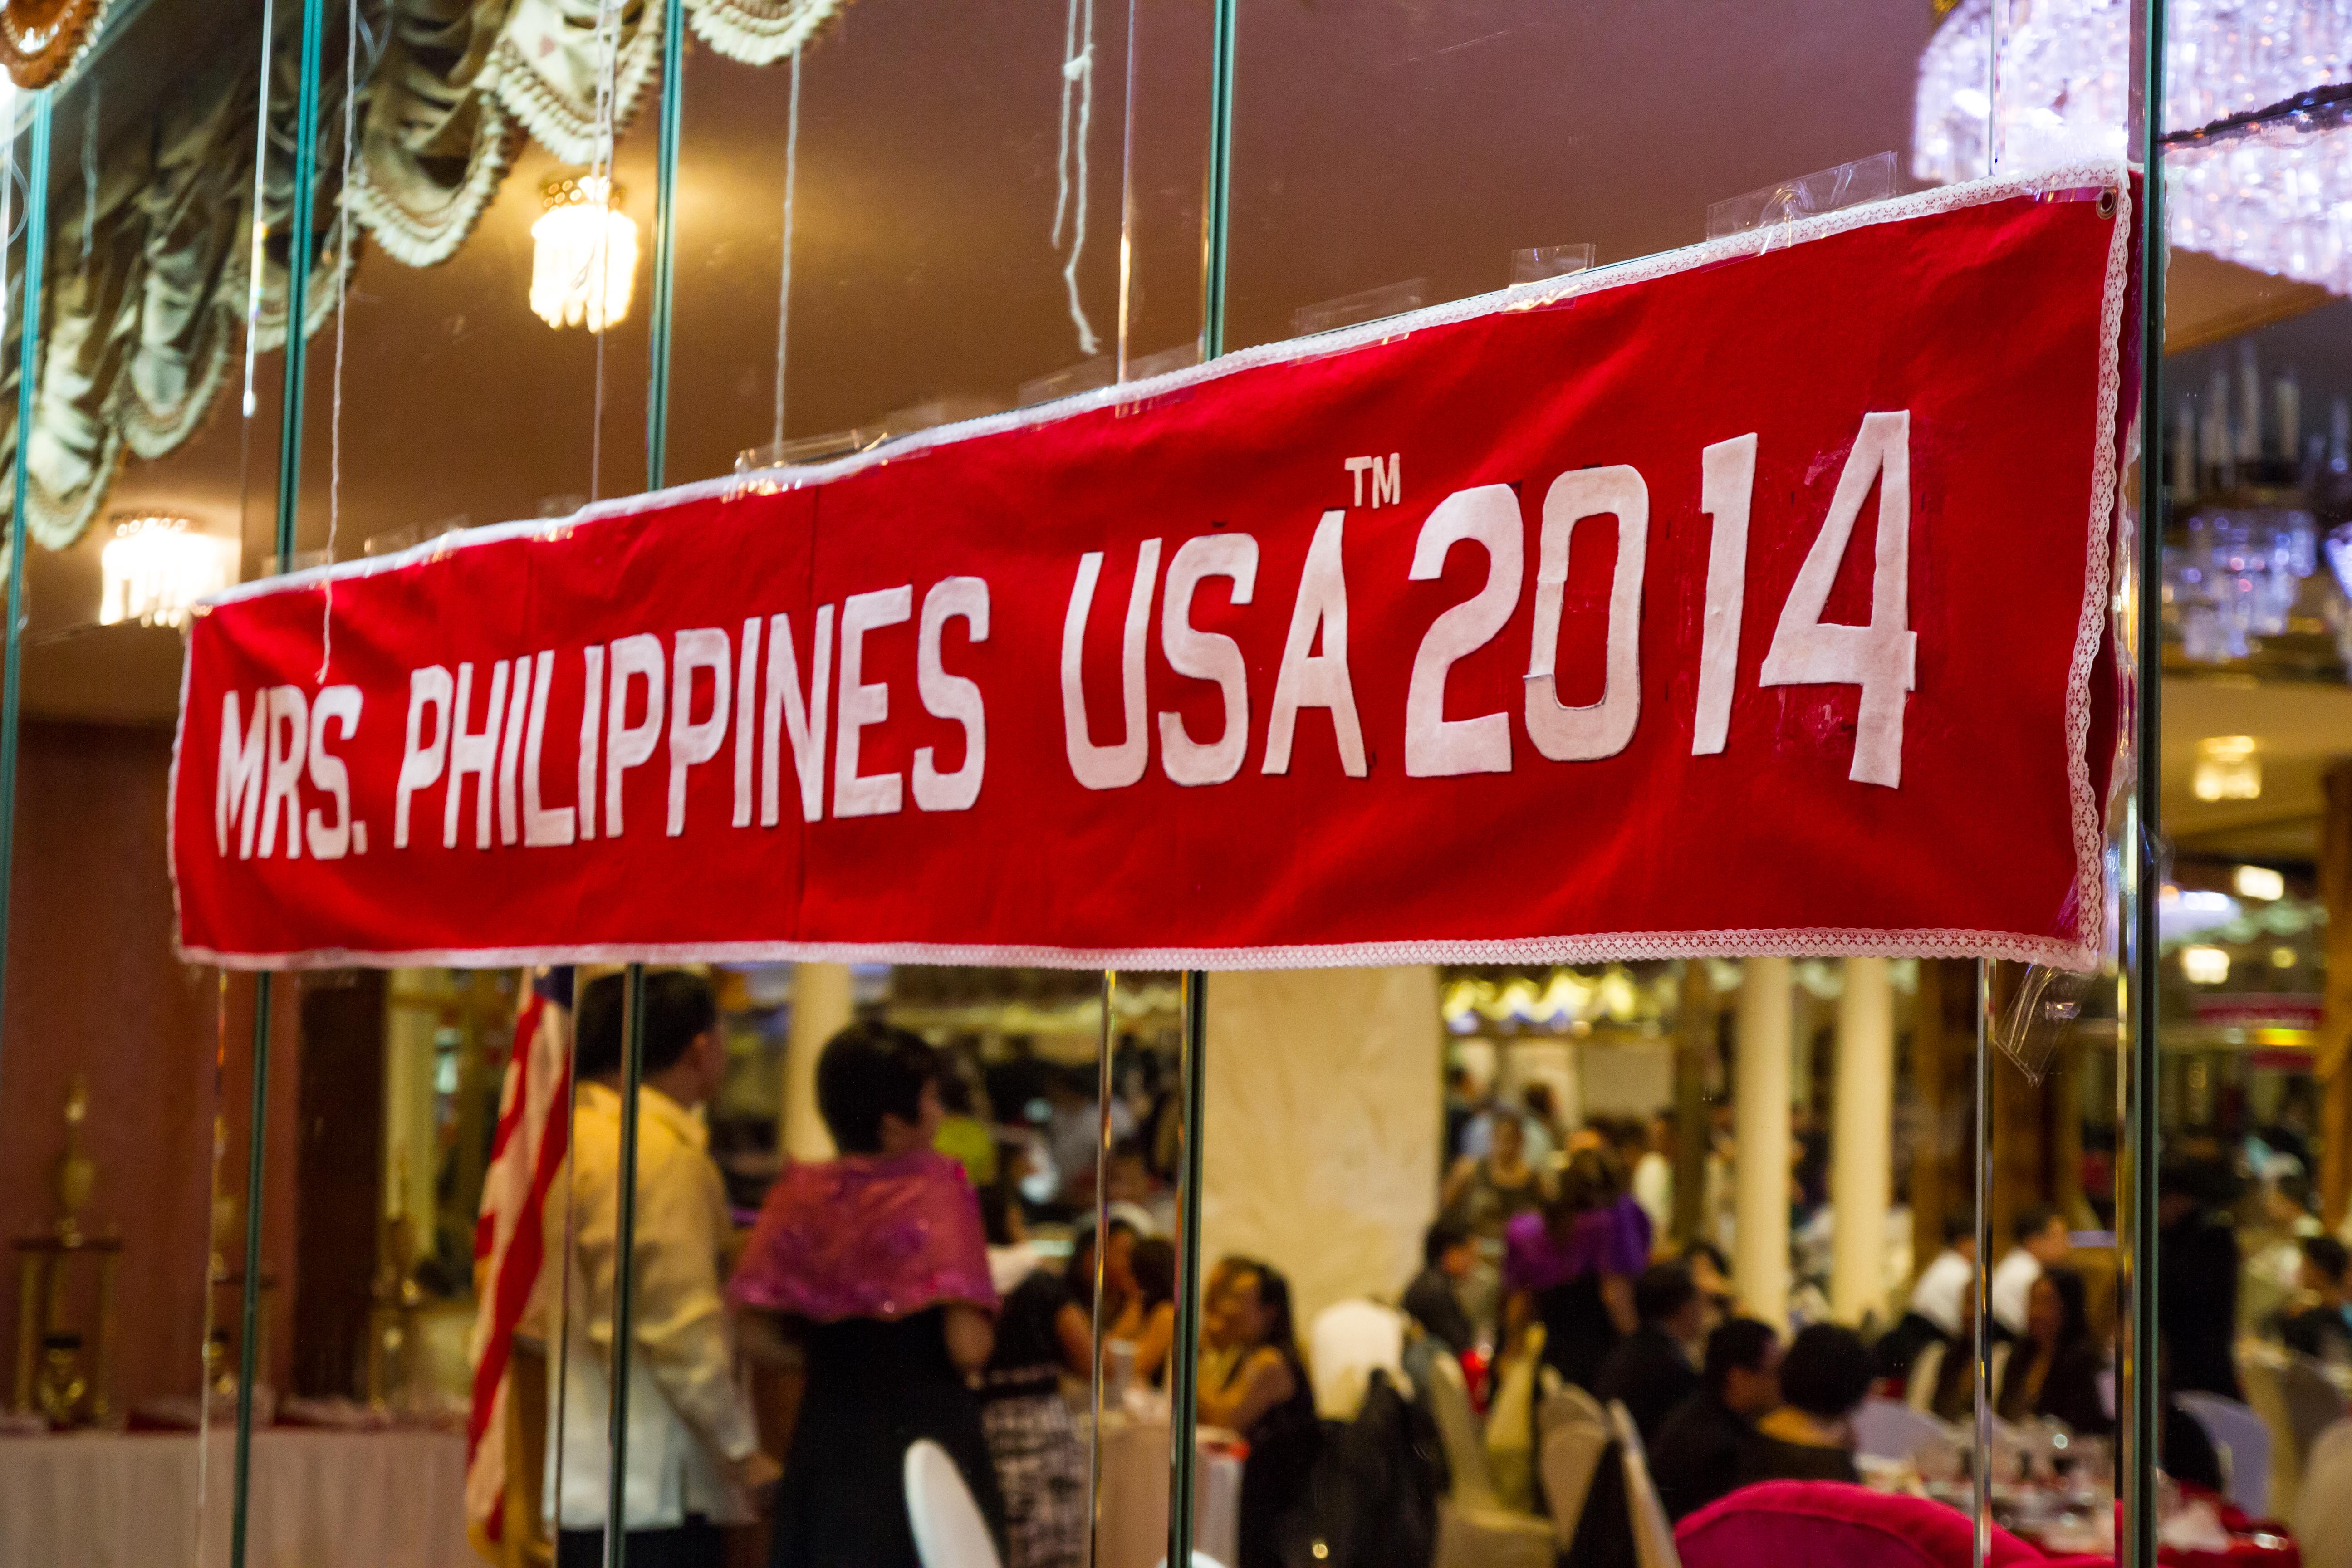 Mrs_Philippines_USAtm_2014244